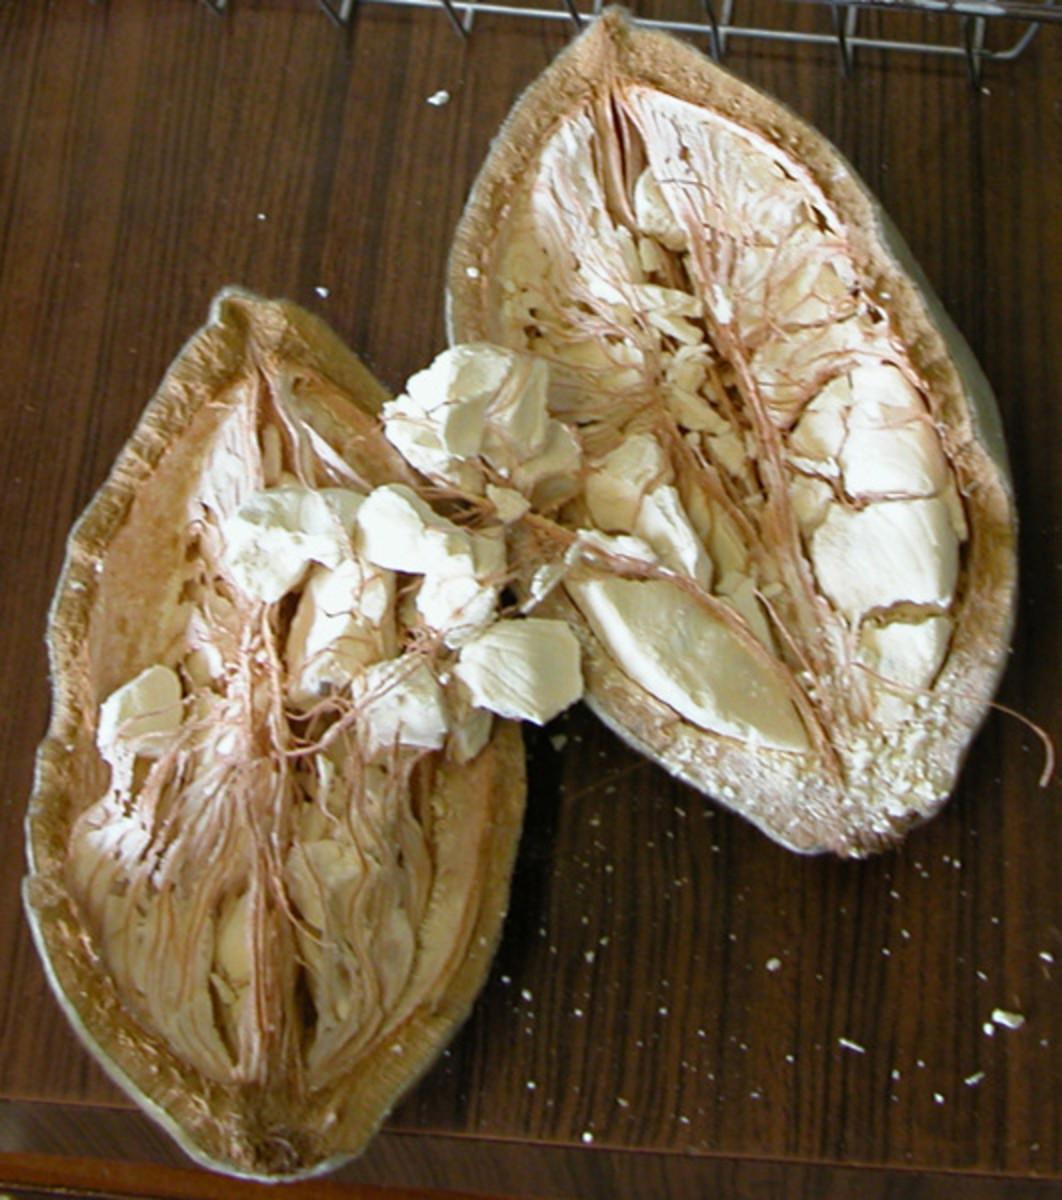 Fruit of the Baobab